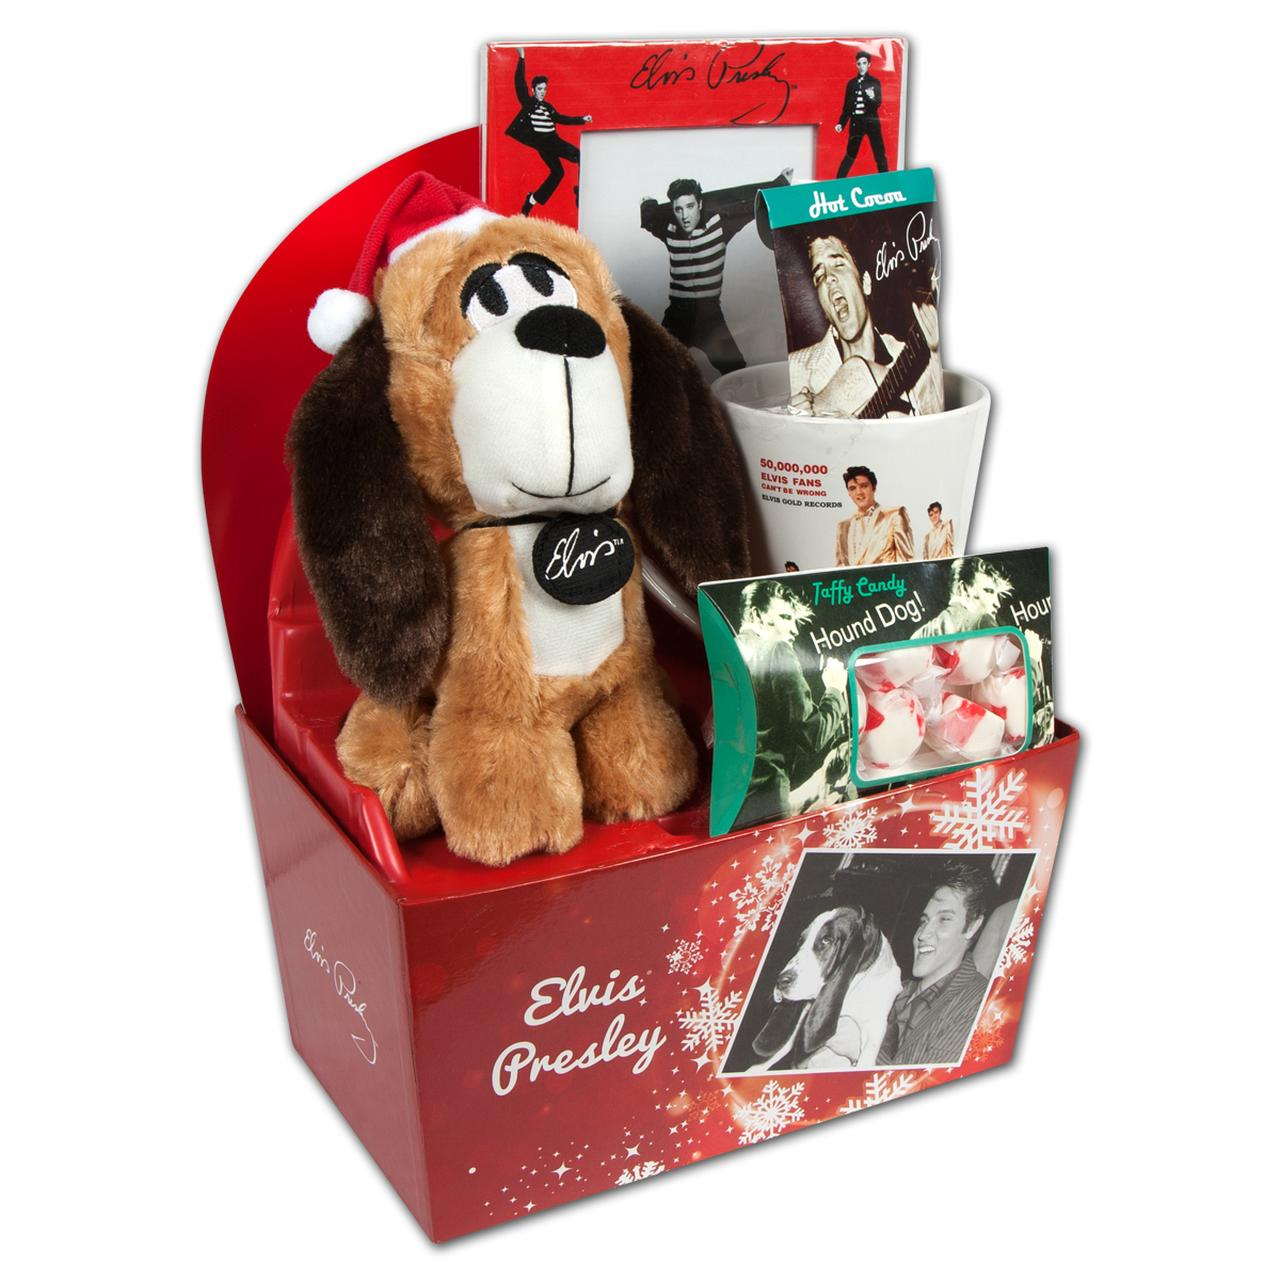 Elvis presley hound dog winter gift set for Unique christmas gifts for dog lovers